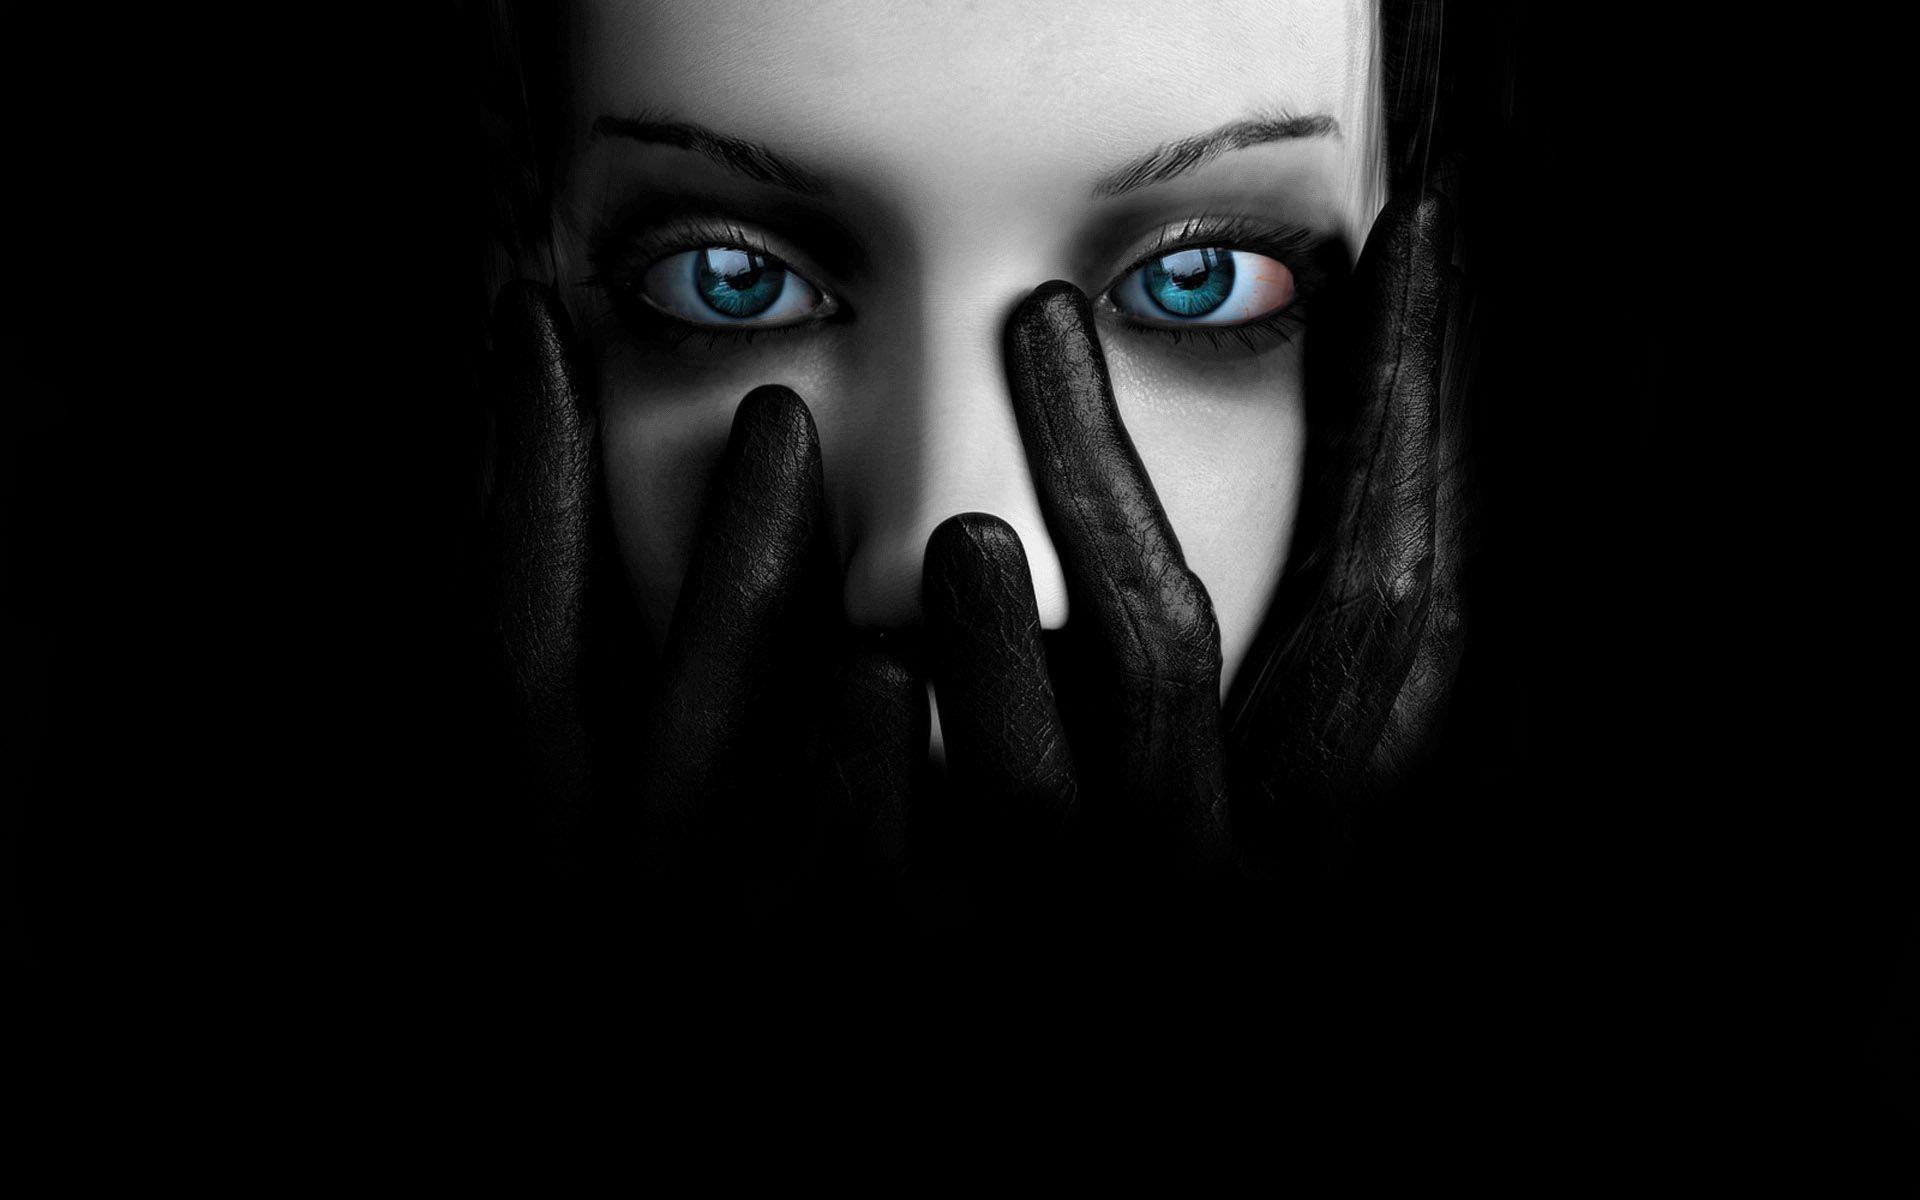 Horror Black Wallpaper Hd The Wallpaper Hub Eyes Wallpaper Black Hd Wallpaper Gothic Wallpaper